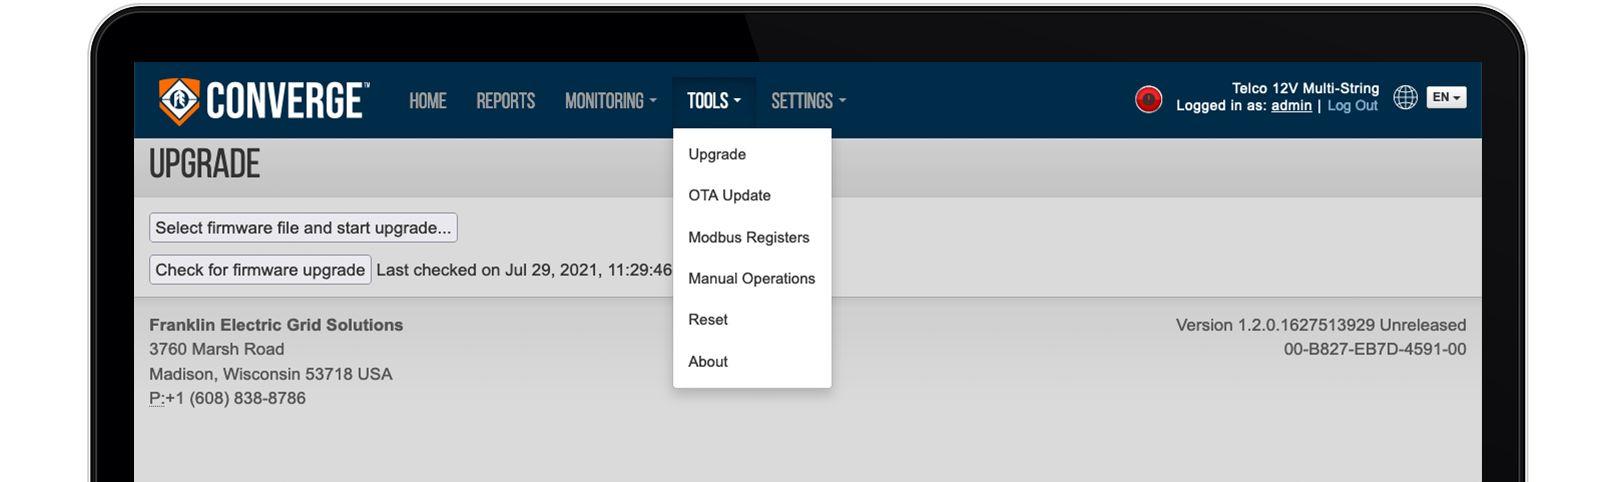 CELLGUARD Wireless - Converge - Tools.psd